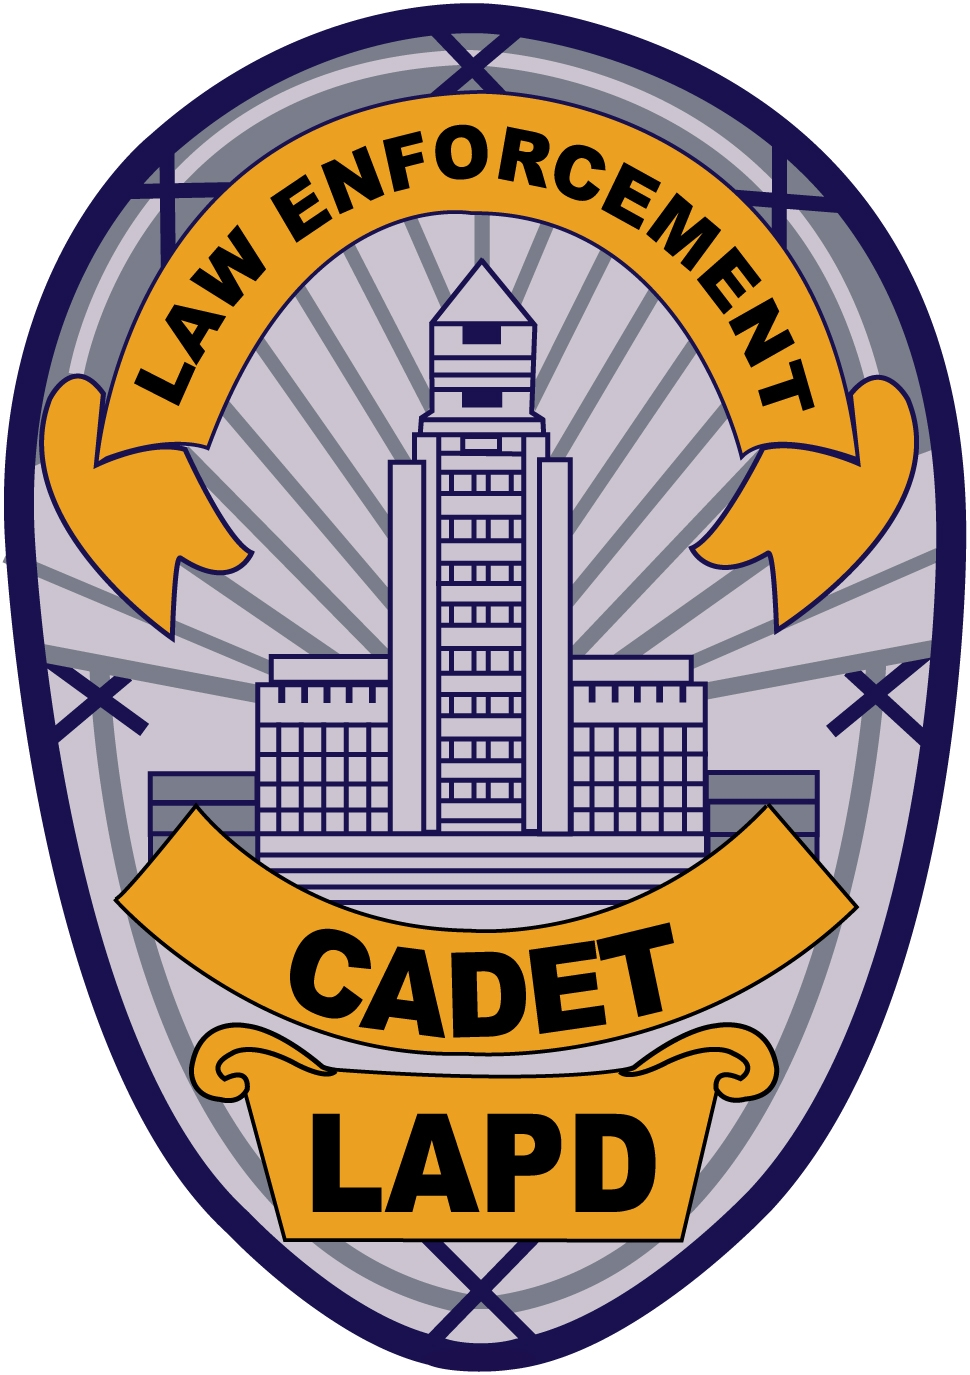 lapd badge - photo #43